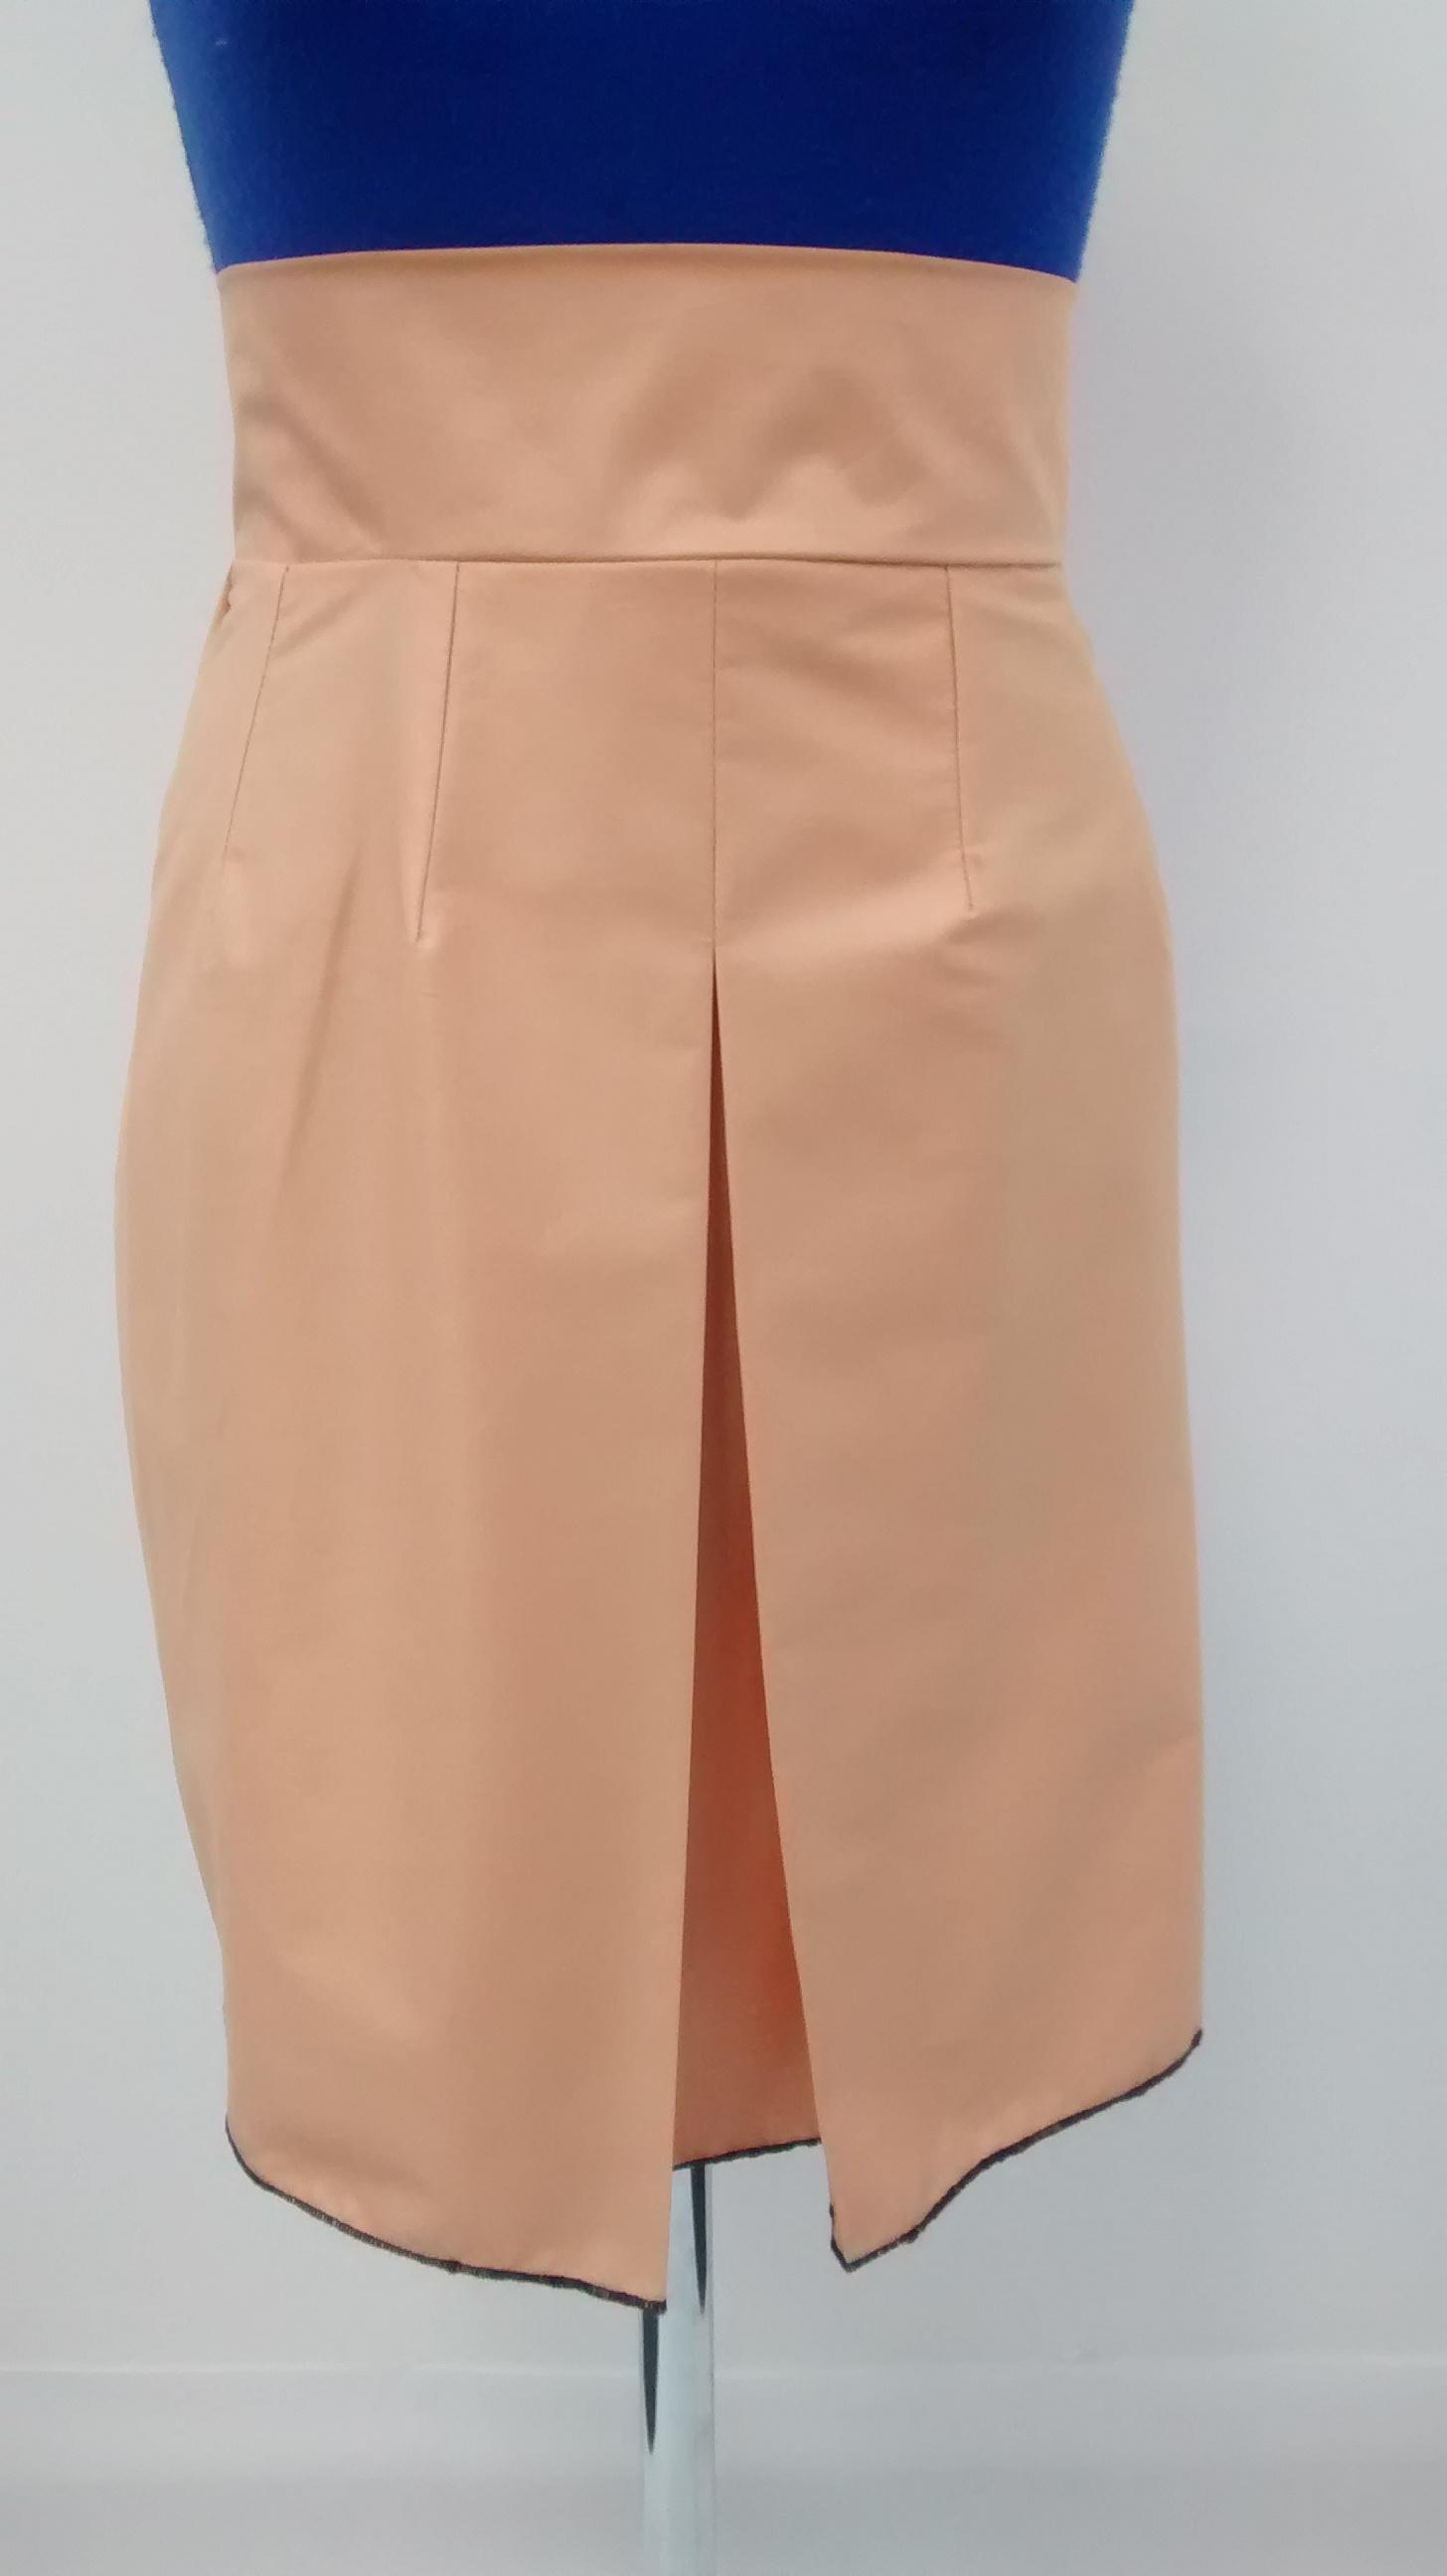 Central pleat skirt